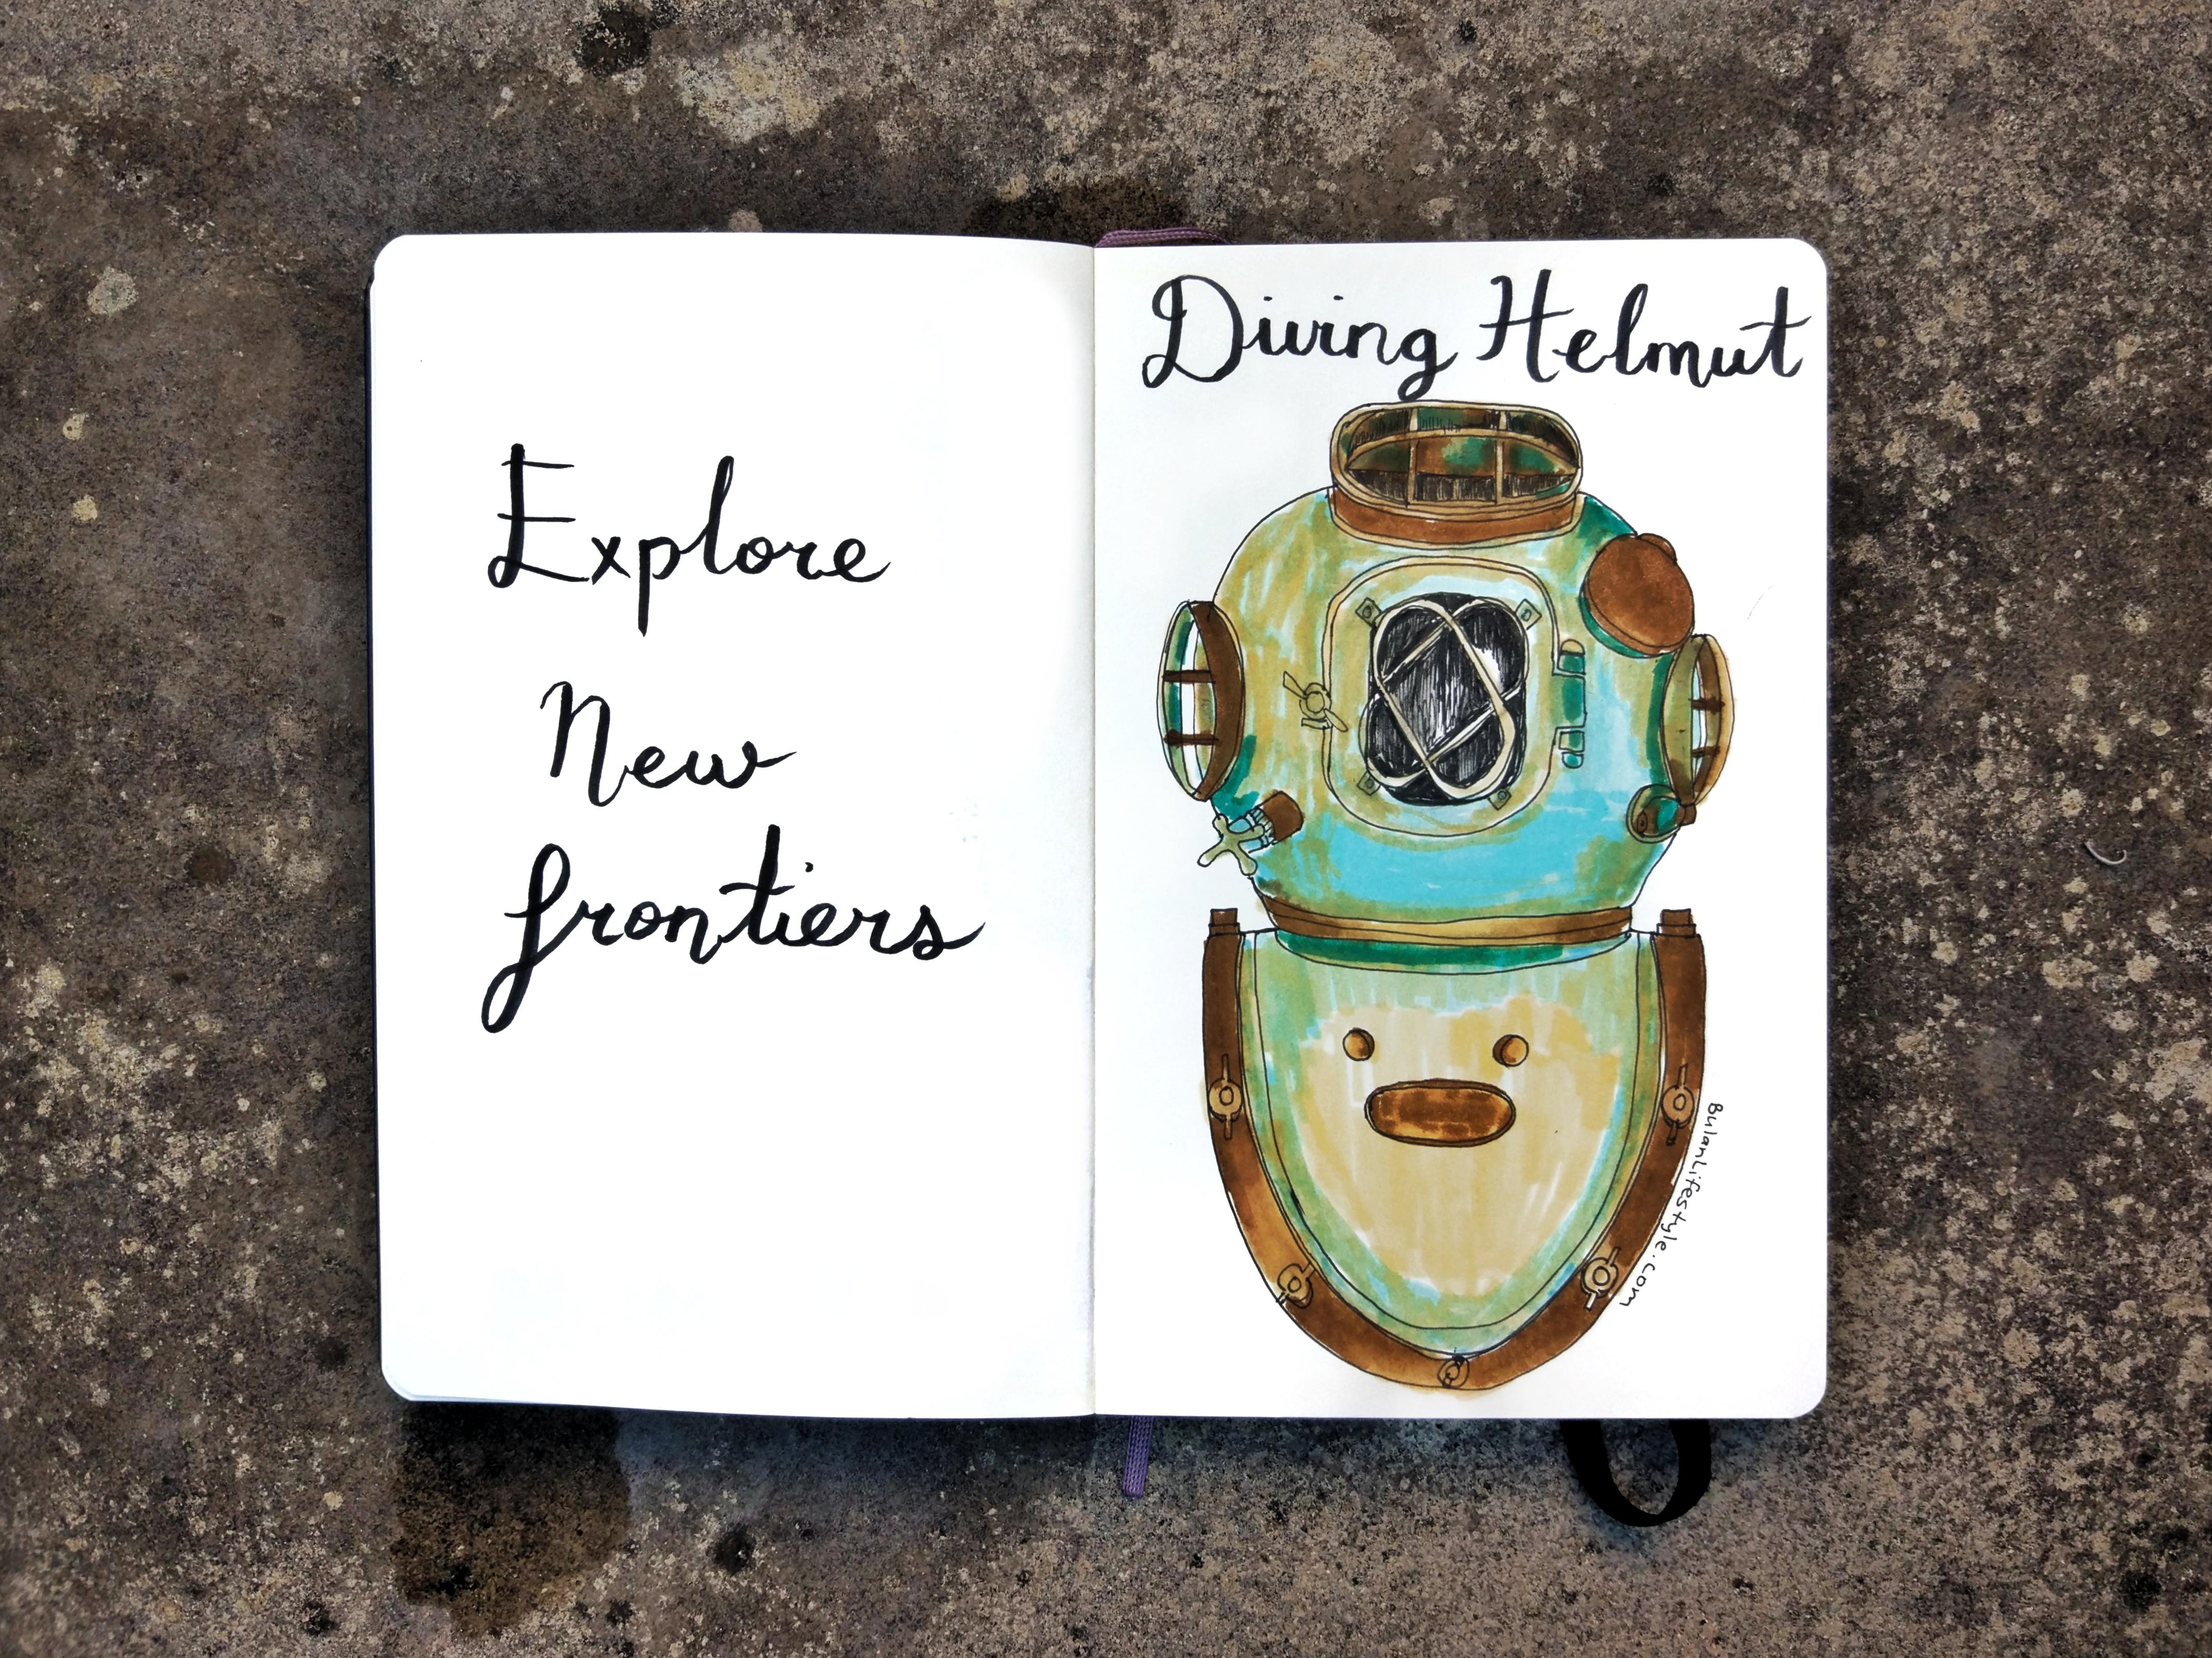 Explore new frontiers